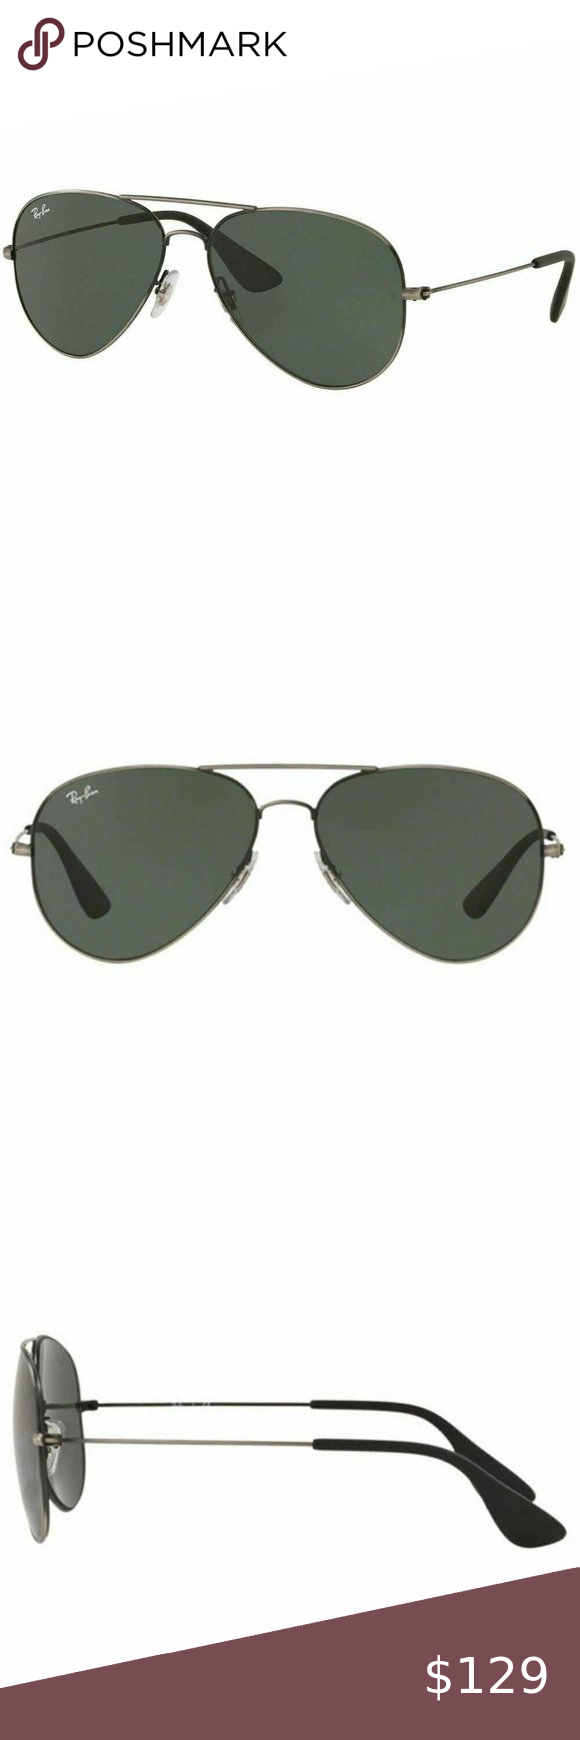 Ray Ban Aviator Style Sunglasses W Dark Green Lens Aviator Sunglasses Style Aviator Style Fashion Sunglasses